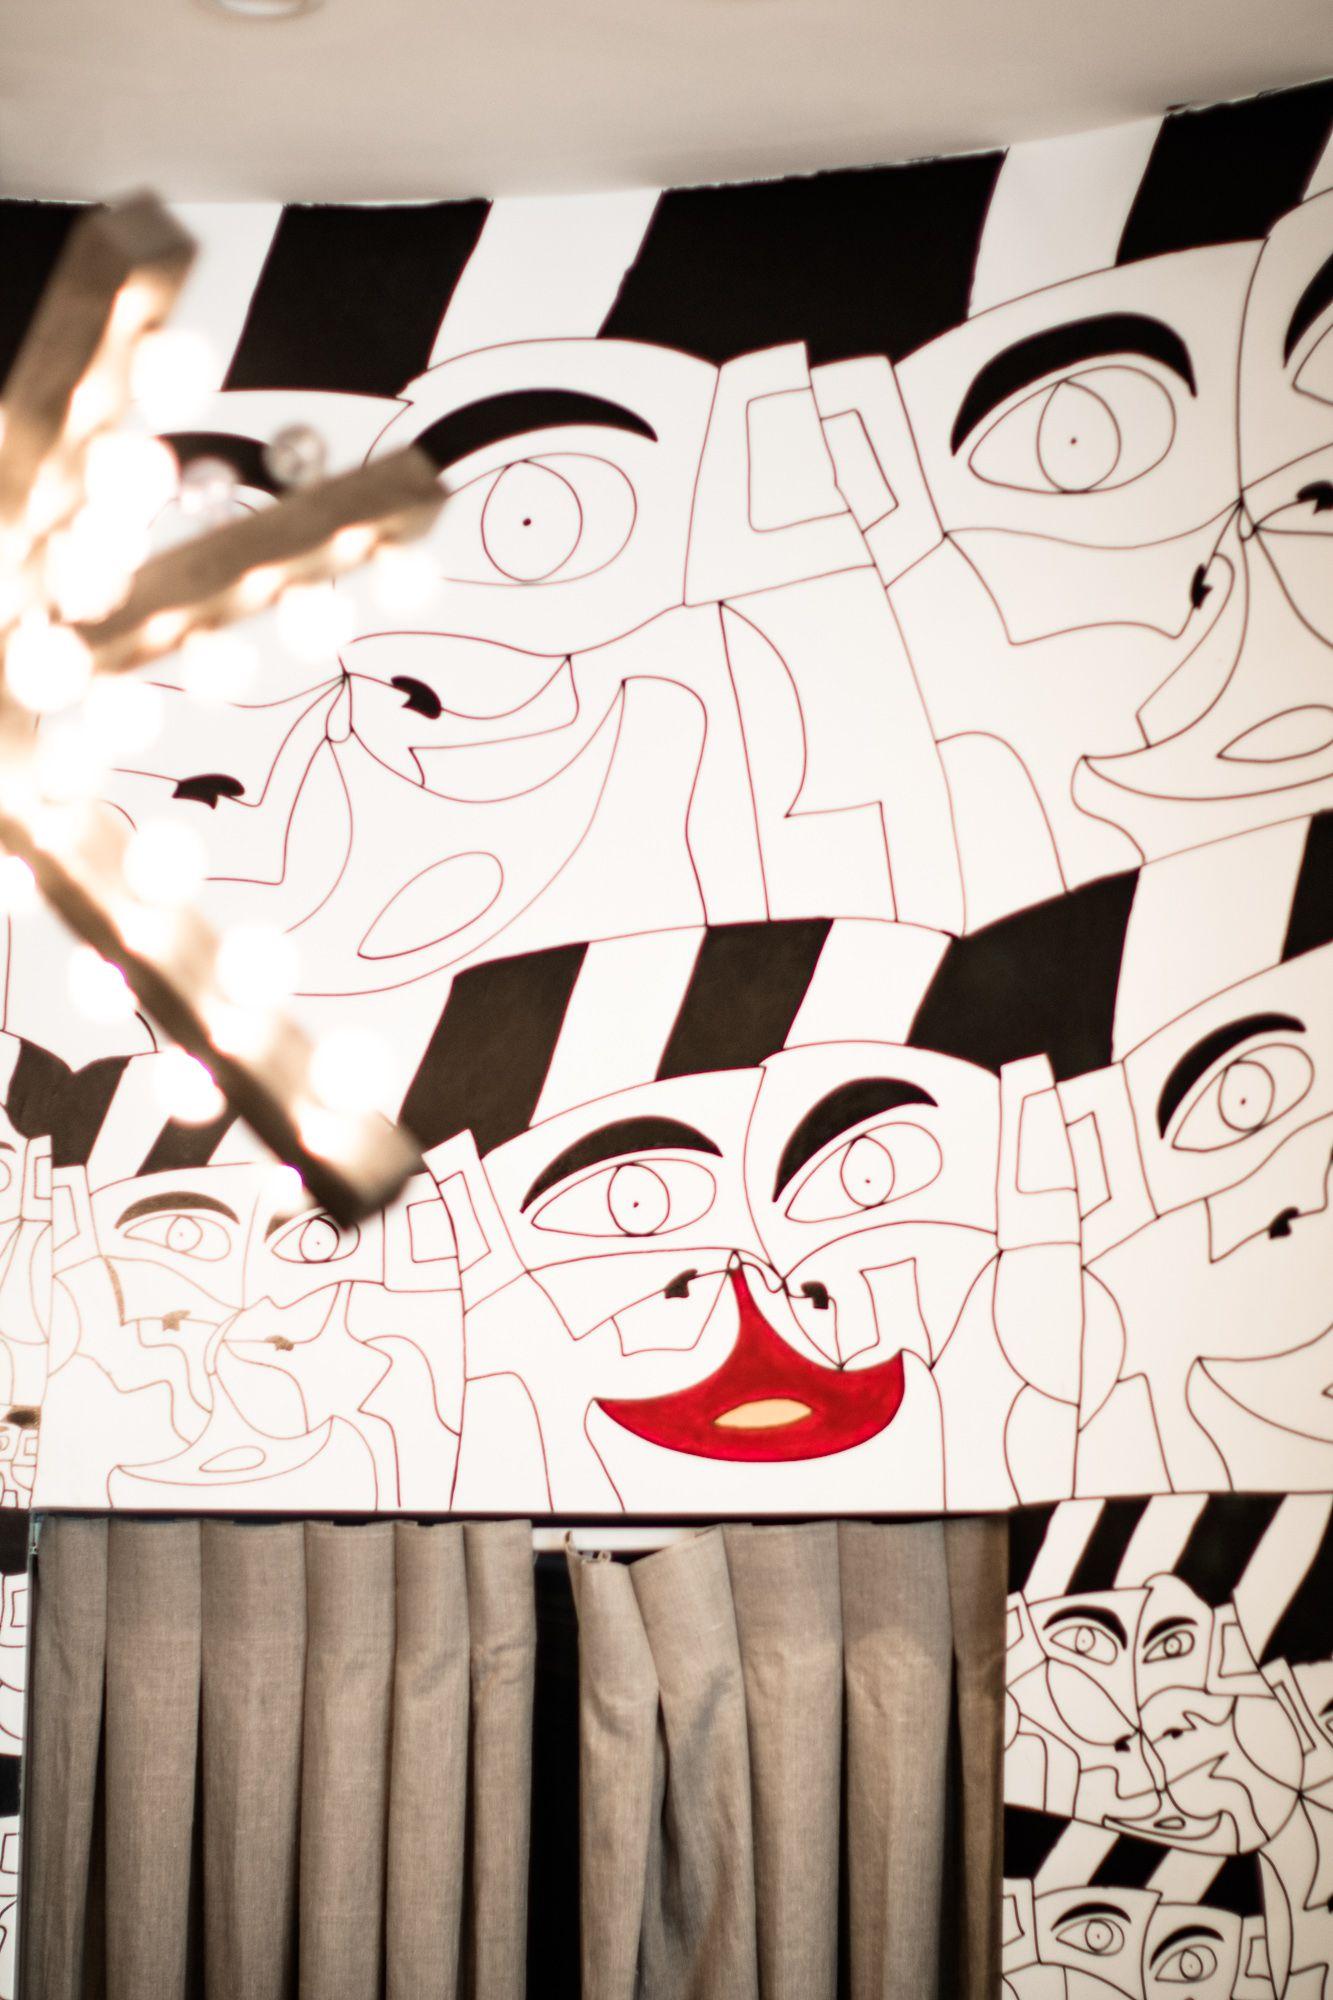 Faces of Hope Mural detail by Ricardo Aguilar at Dan Deutsch Sunset Plaza